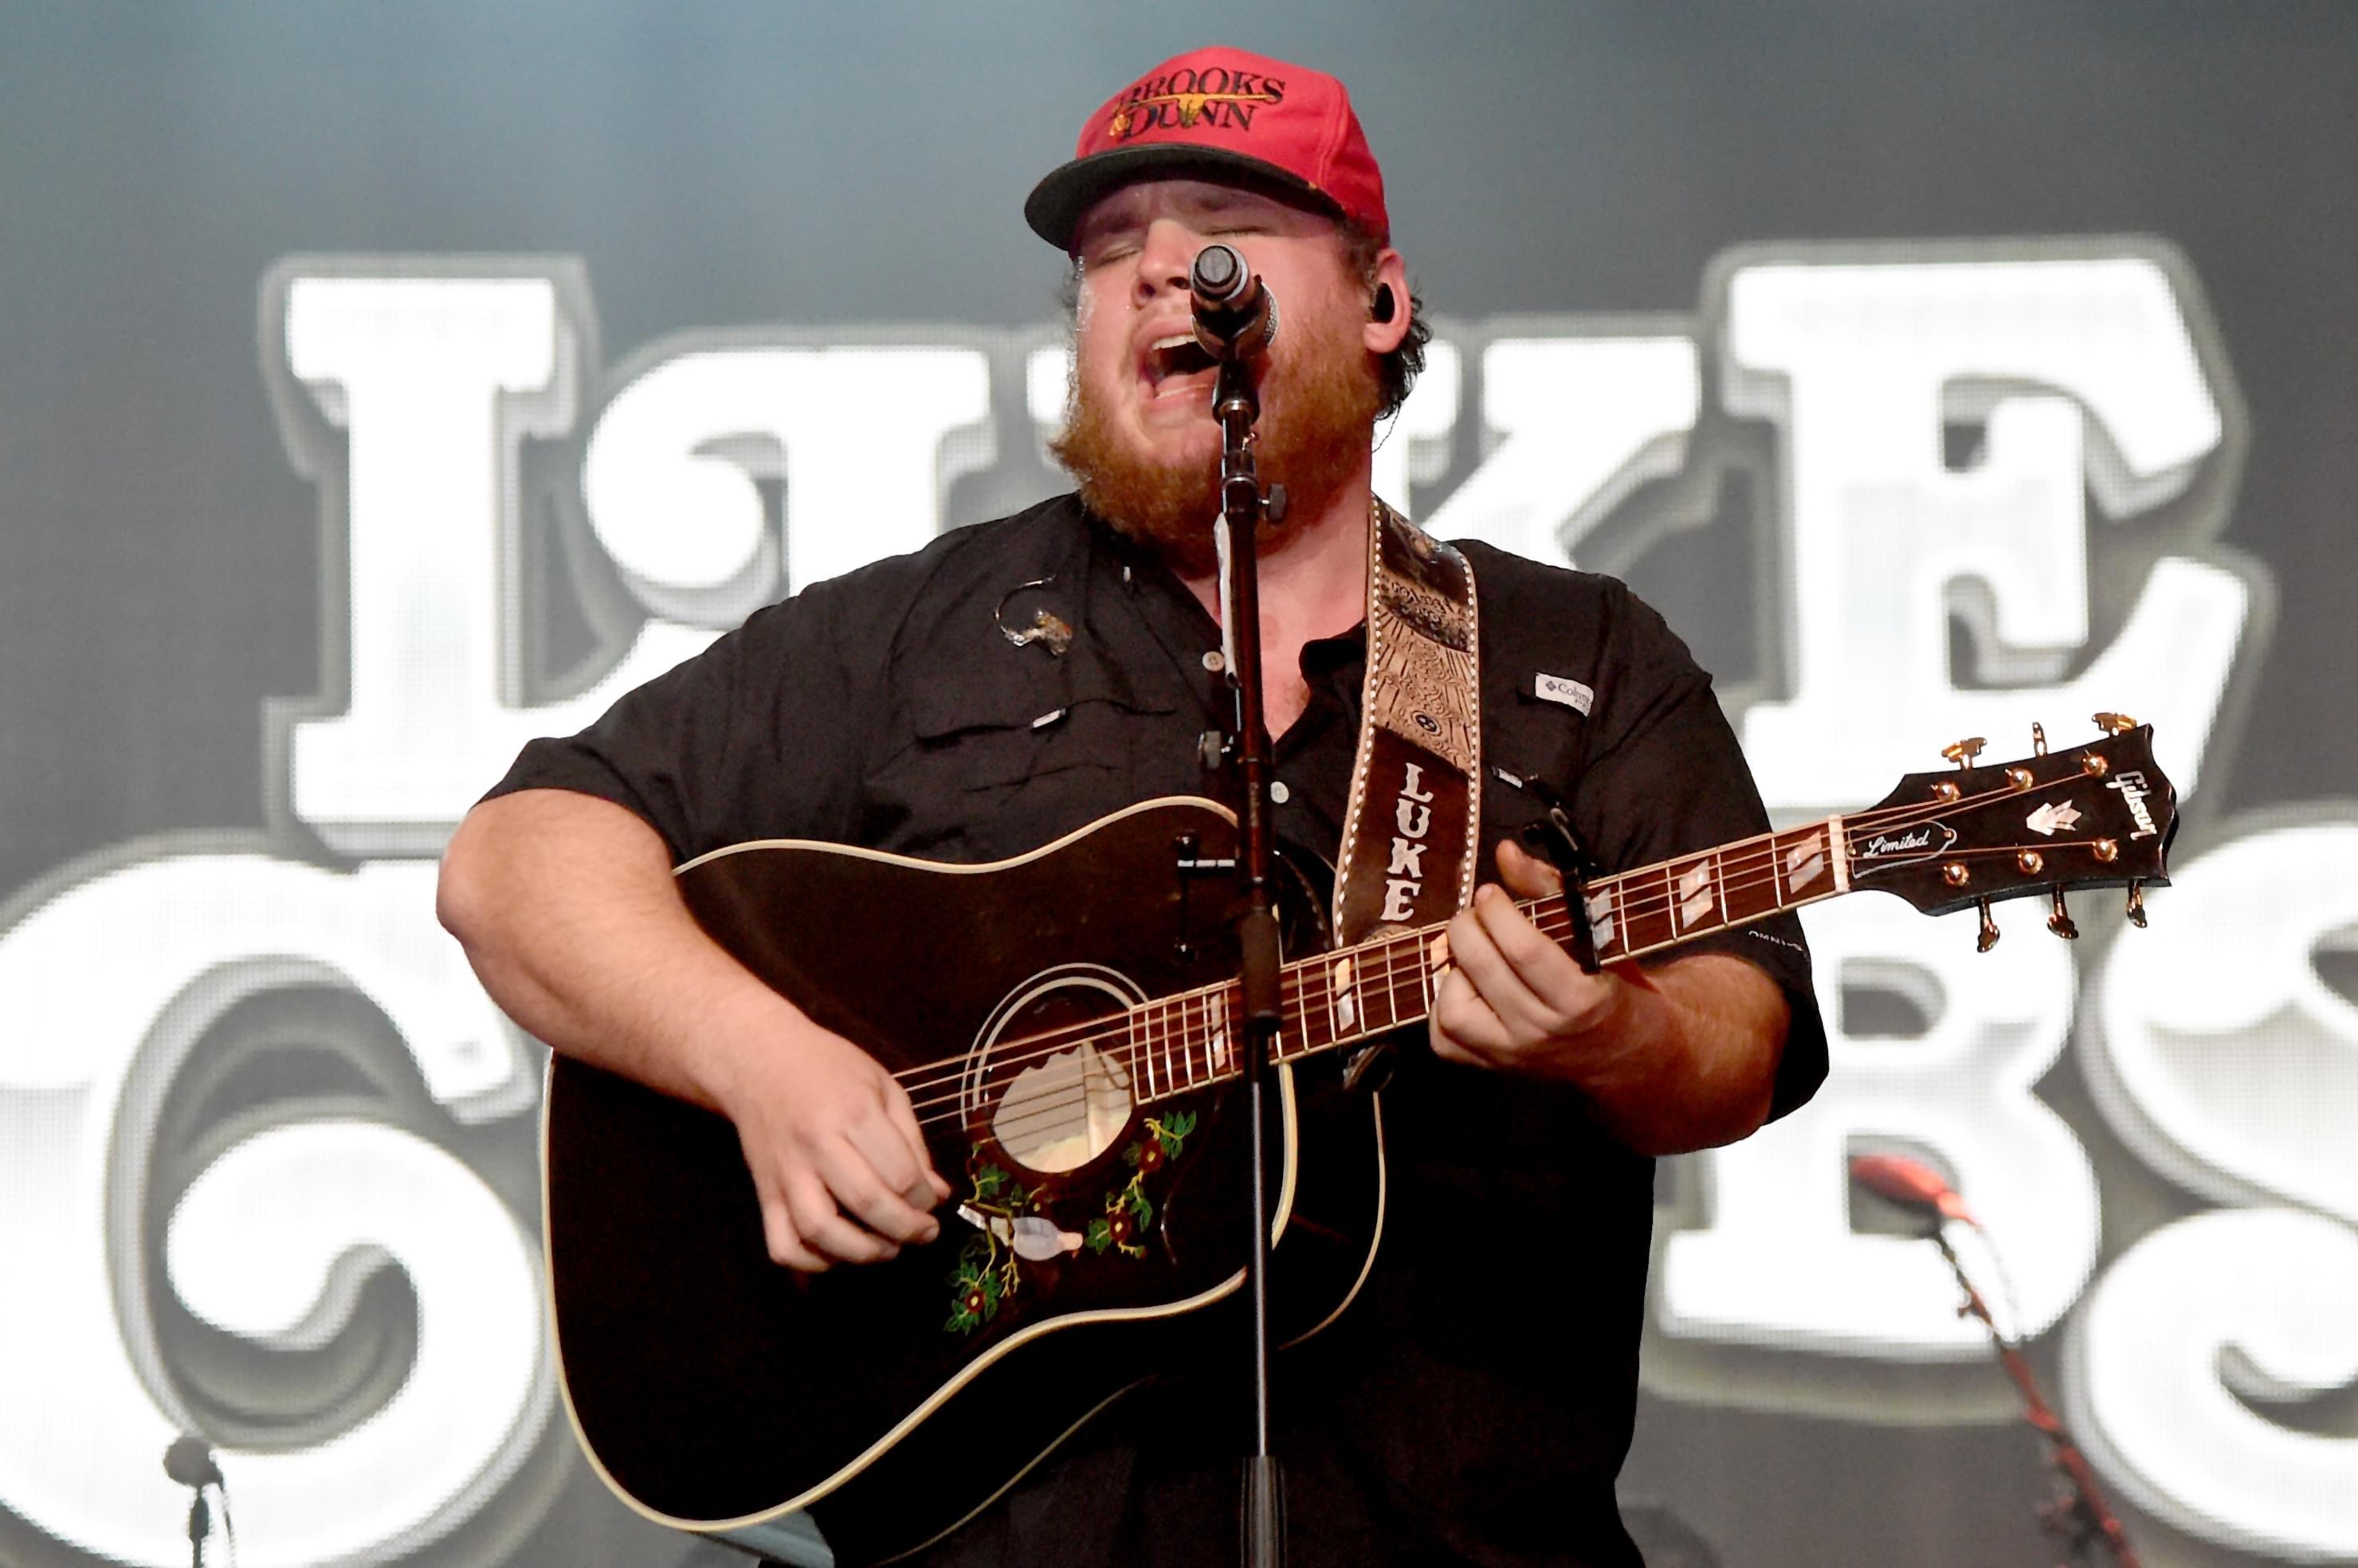 Toddler Belts Out Luke Combs' 'Beer Never Broke My Heart' [WATCH]